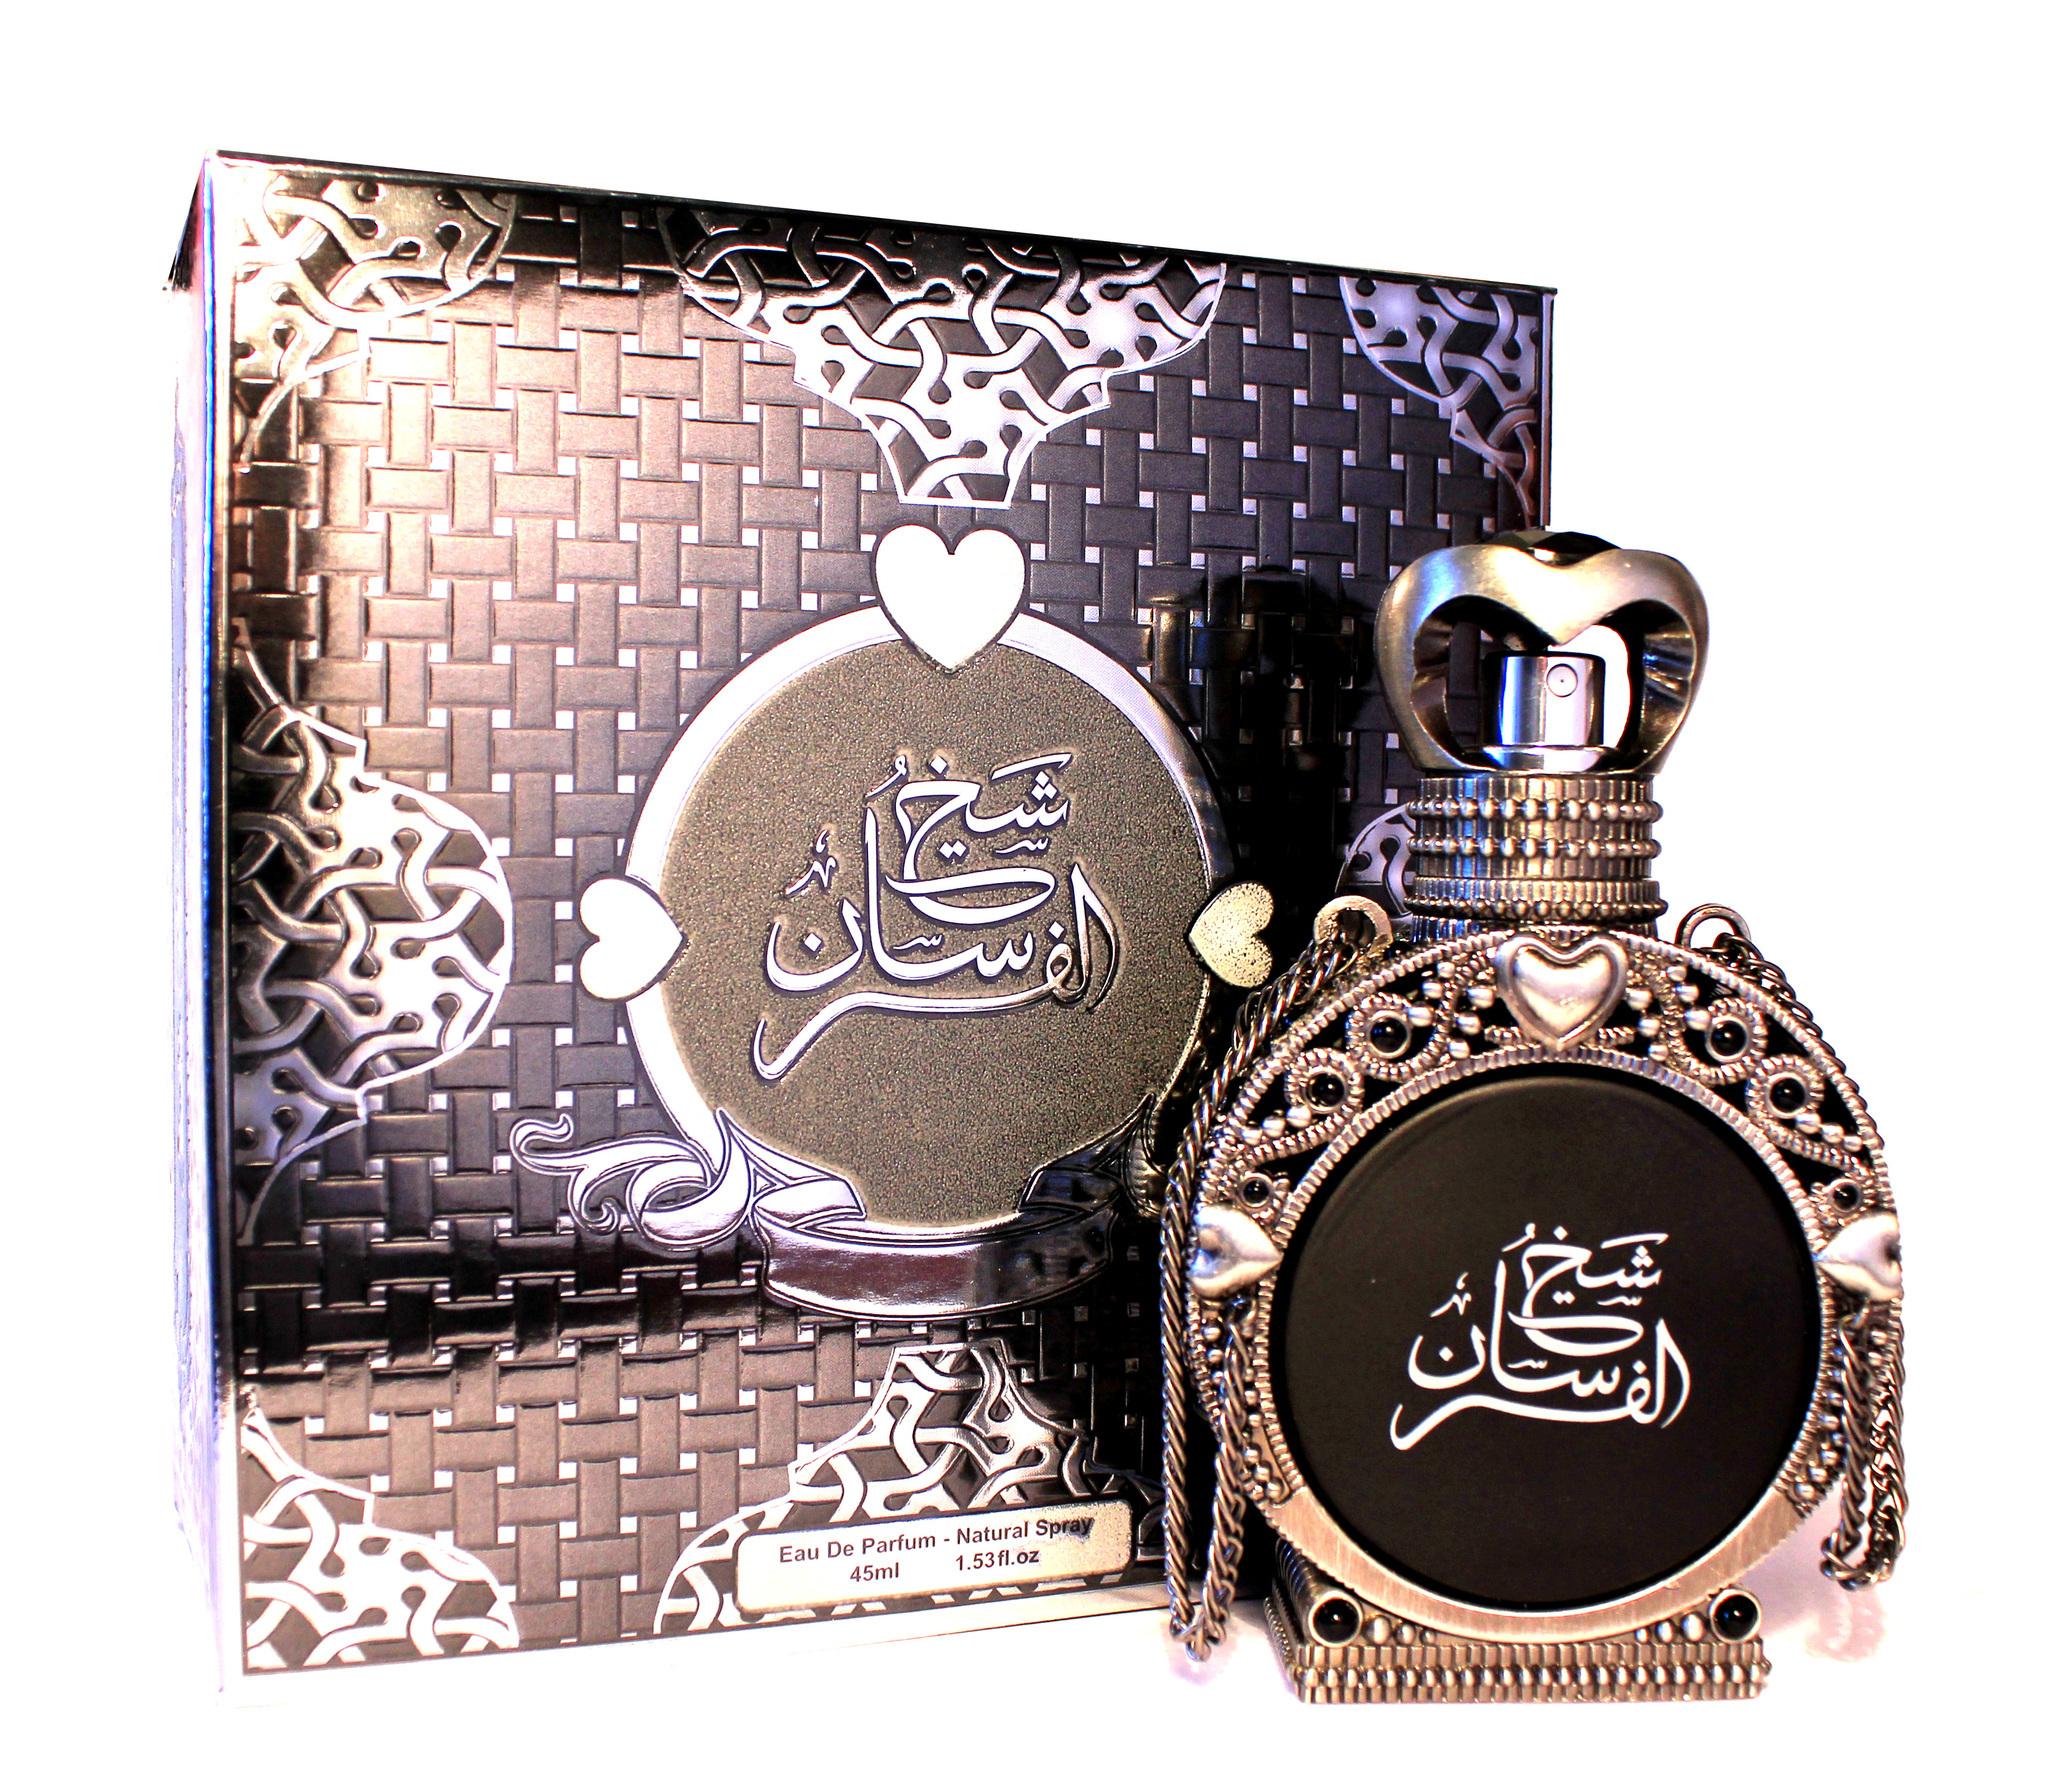 Пробник для Sheik Al Fursan Шейх Аль Фурсан 1 мл спрей от Май Парфюмс My Perfumes